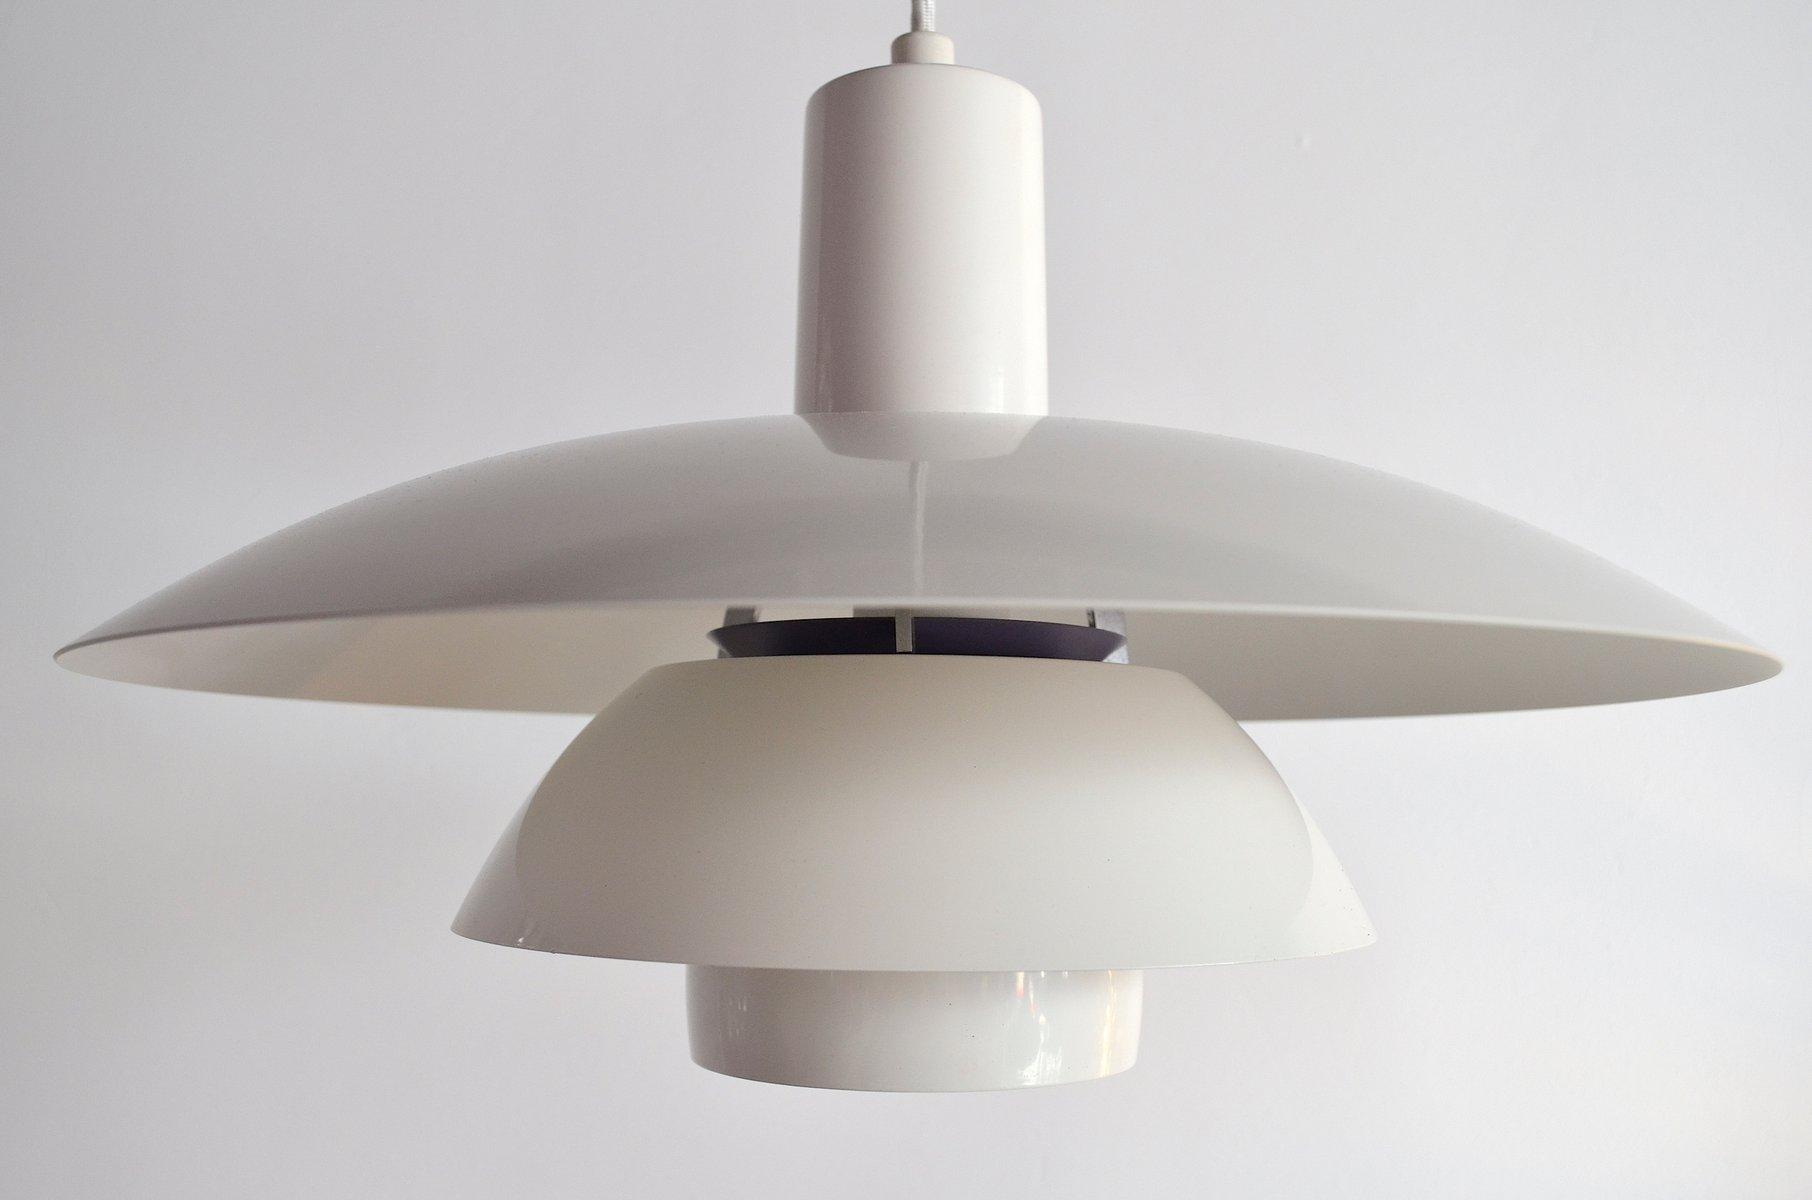 Metal Pendant Lighting Mid Century Ph 4 1 2 4 Metal Pendant Lamp By Poul Henningsen For